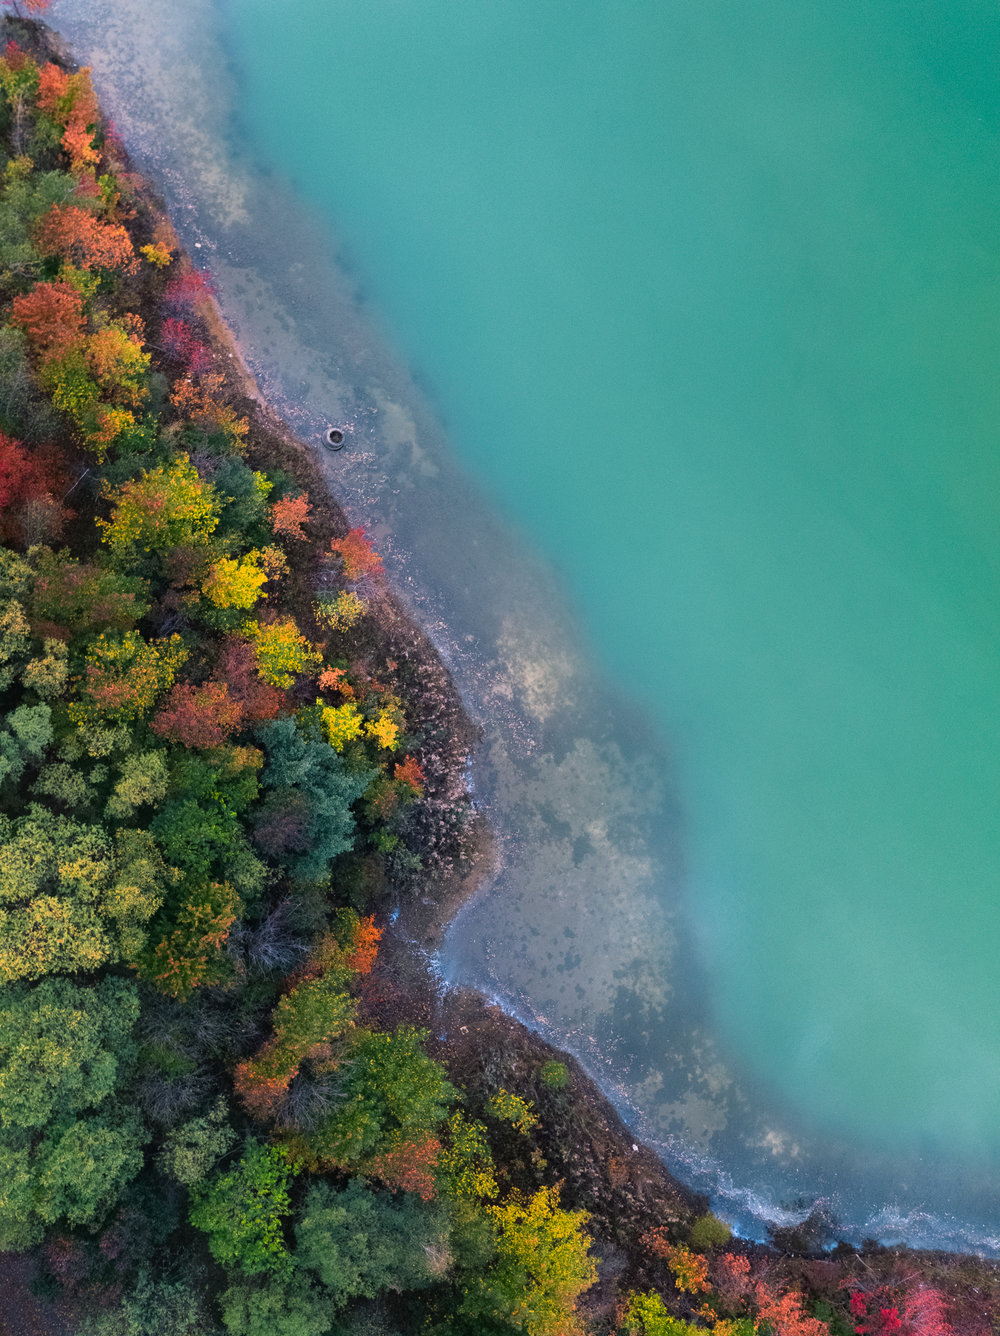 autumnblues_typoland_aerial-1.jpg